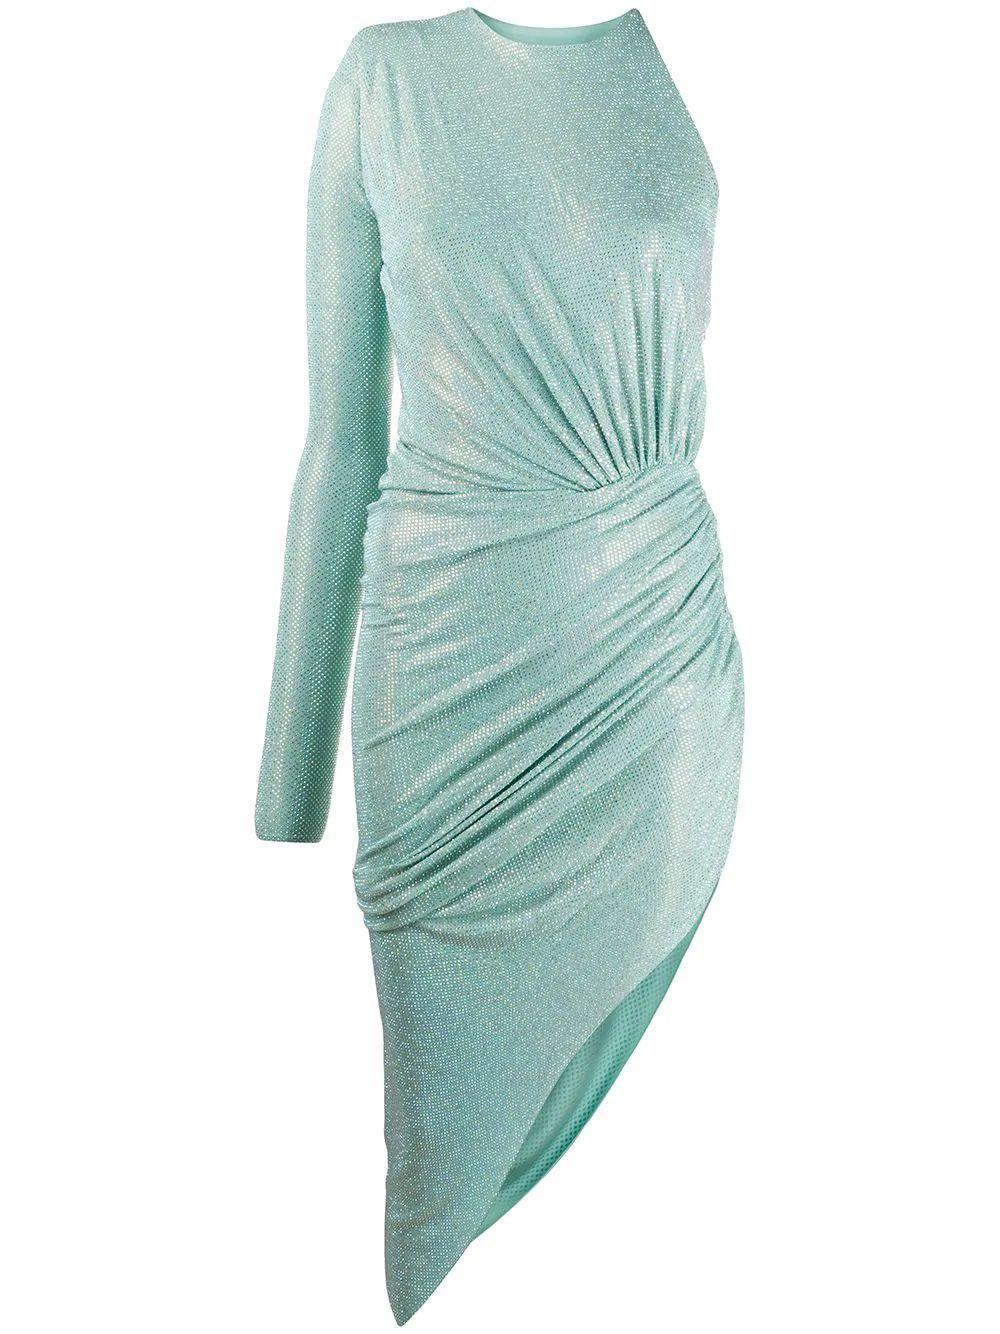 Microcrystal One Sleeve Short Dress Item # 202DR1271B